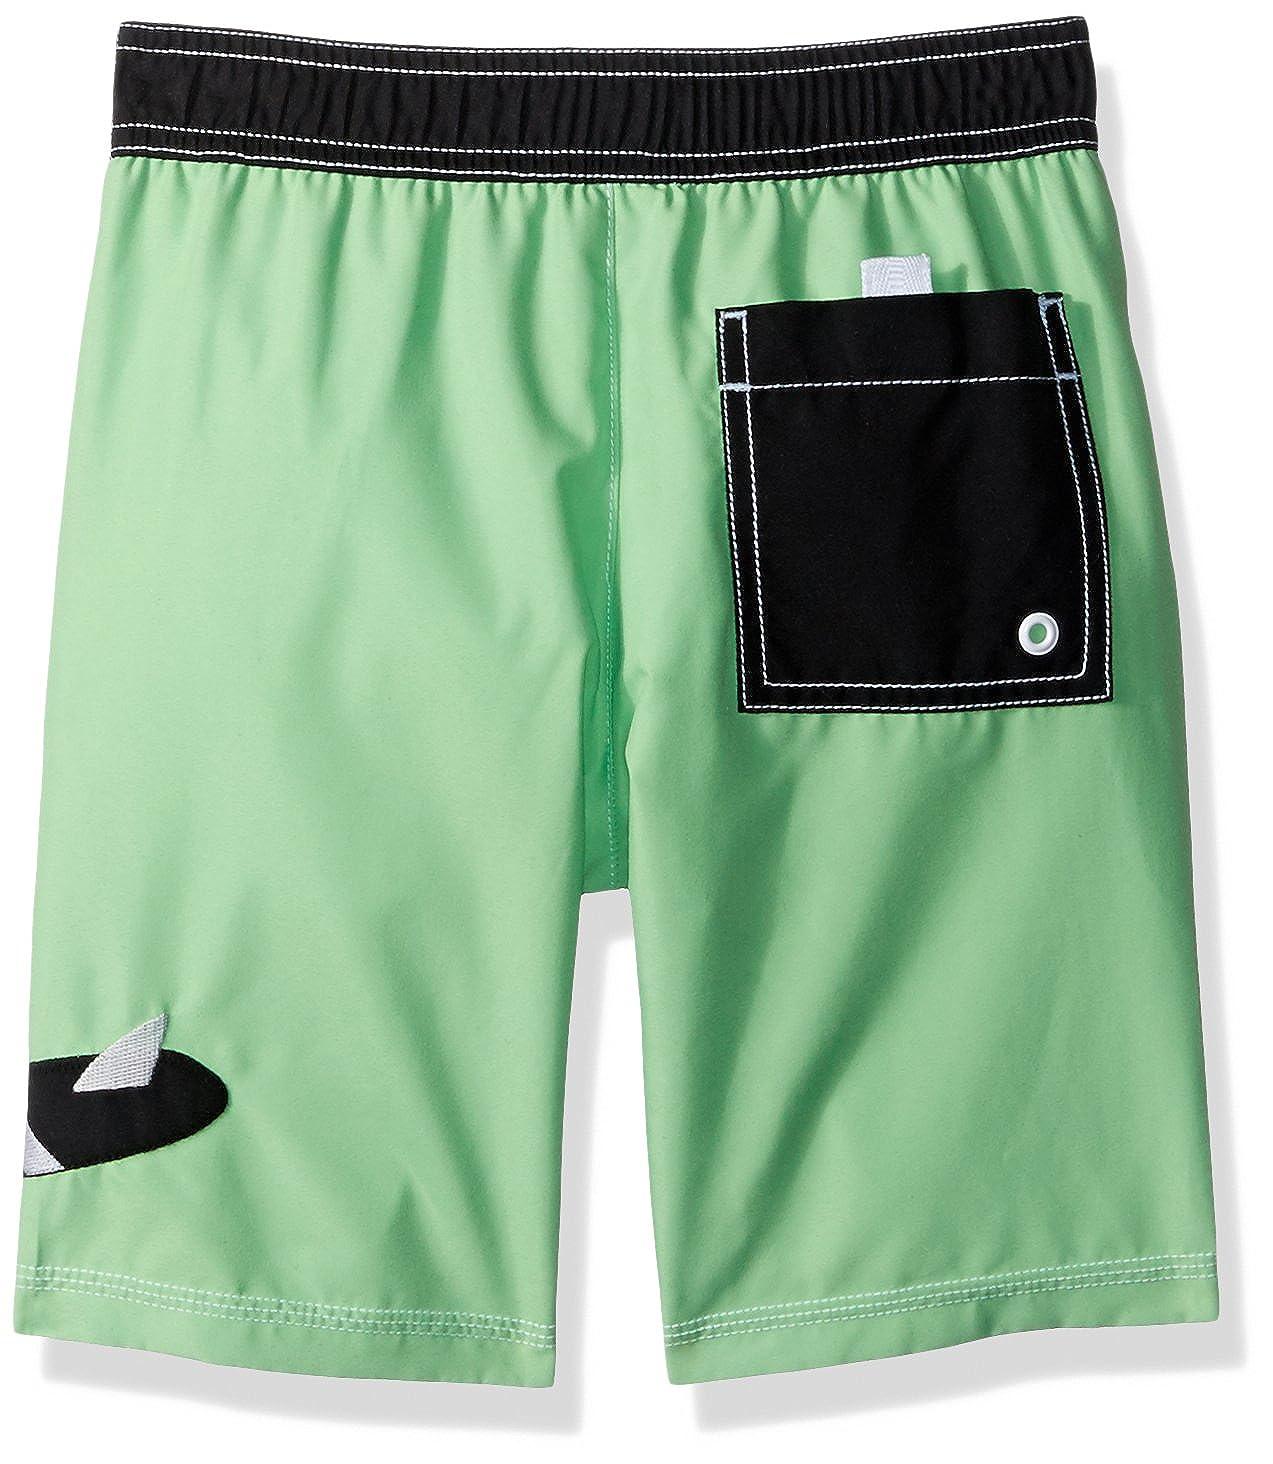 79224f9e6b Amazon.com: Gymboree Boys' Printed Swim Trunks: Clothing